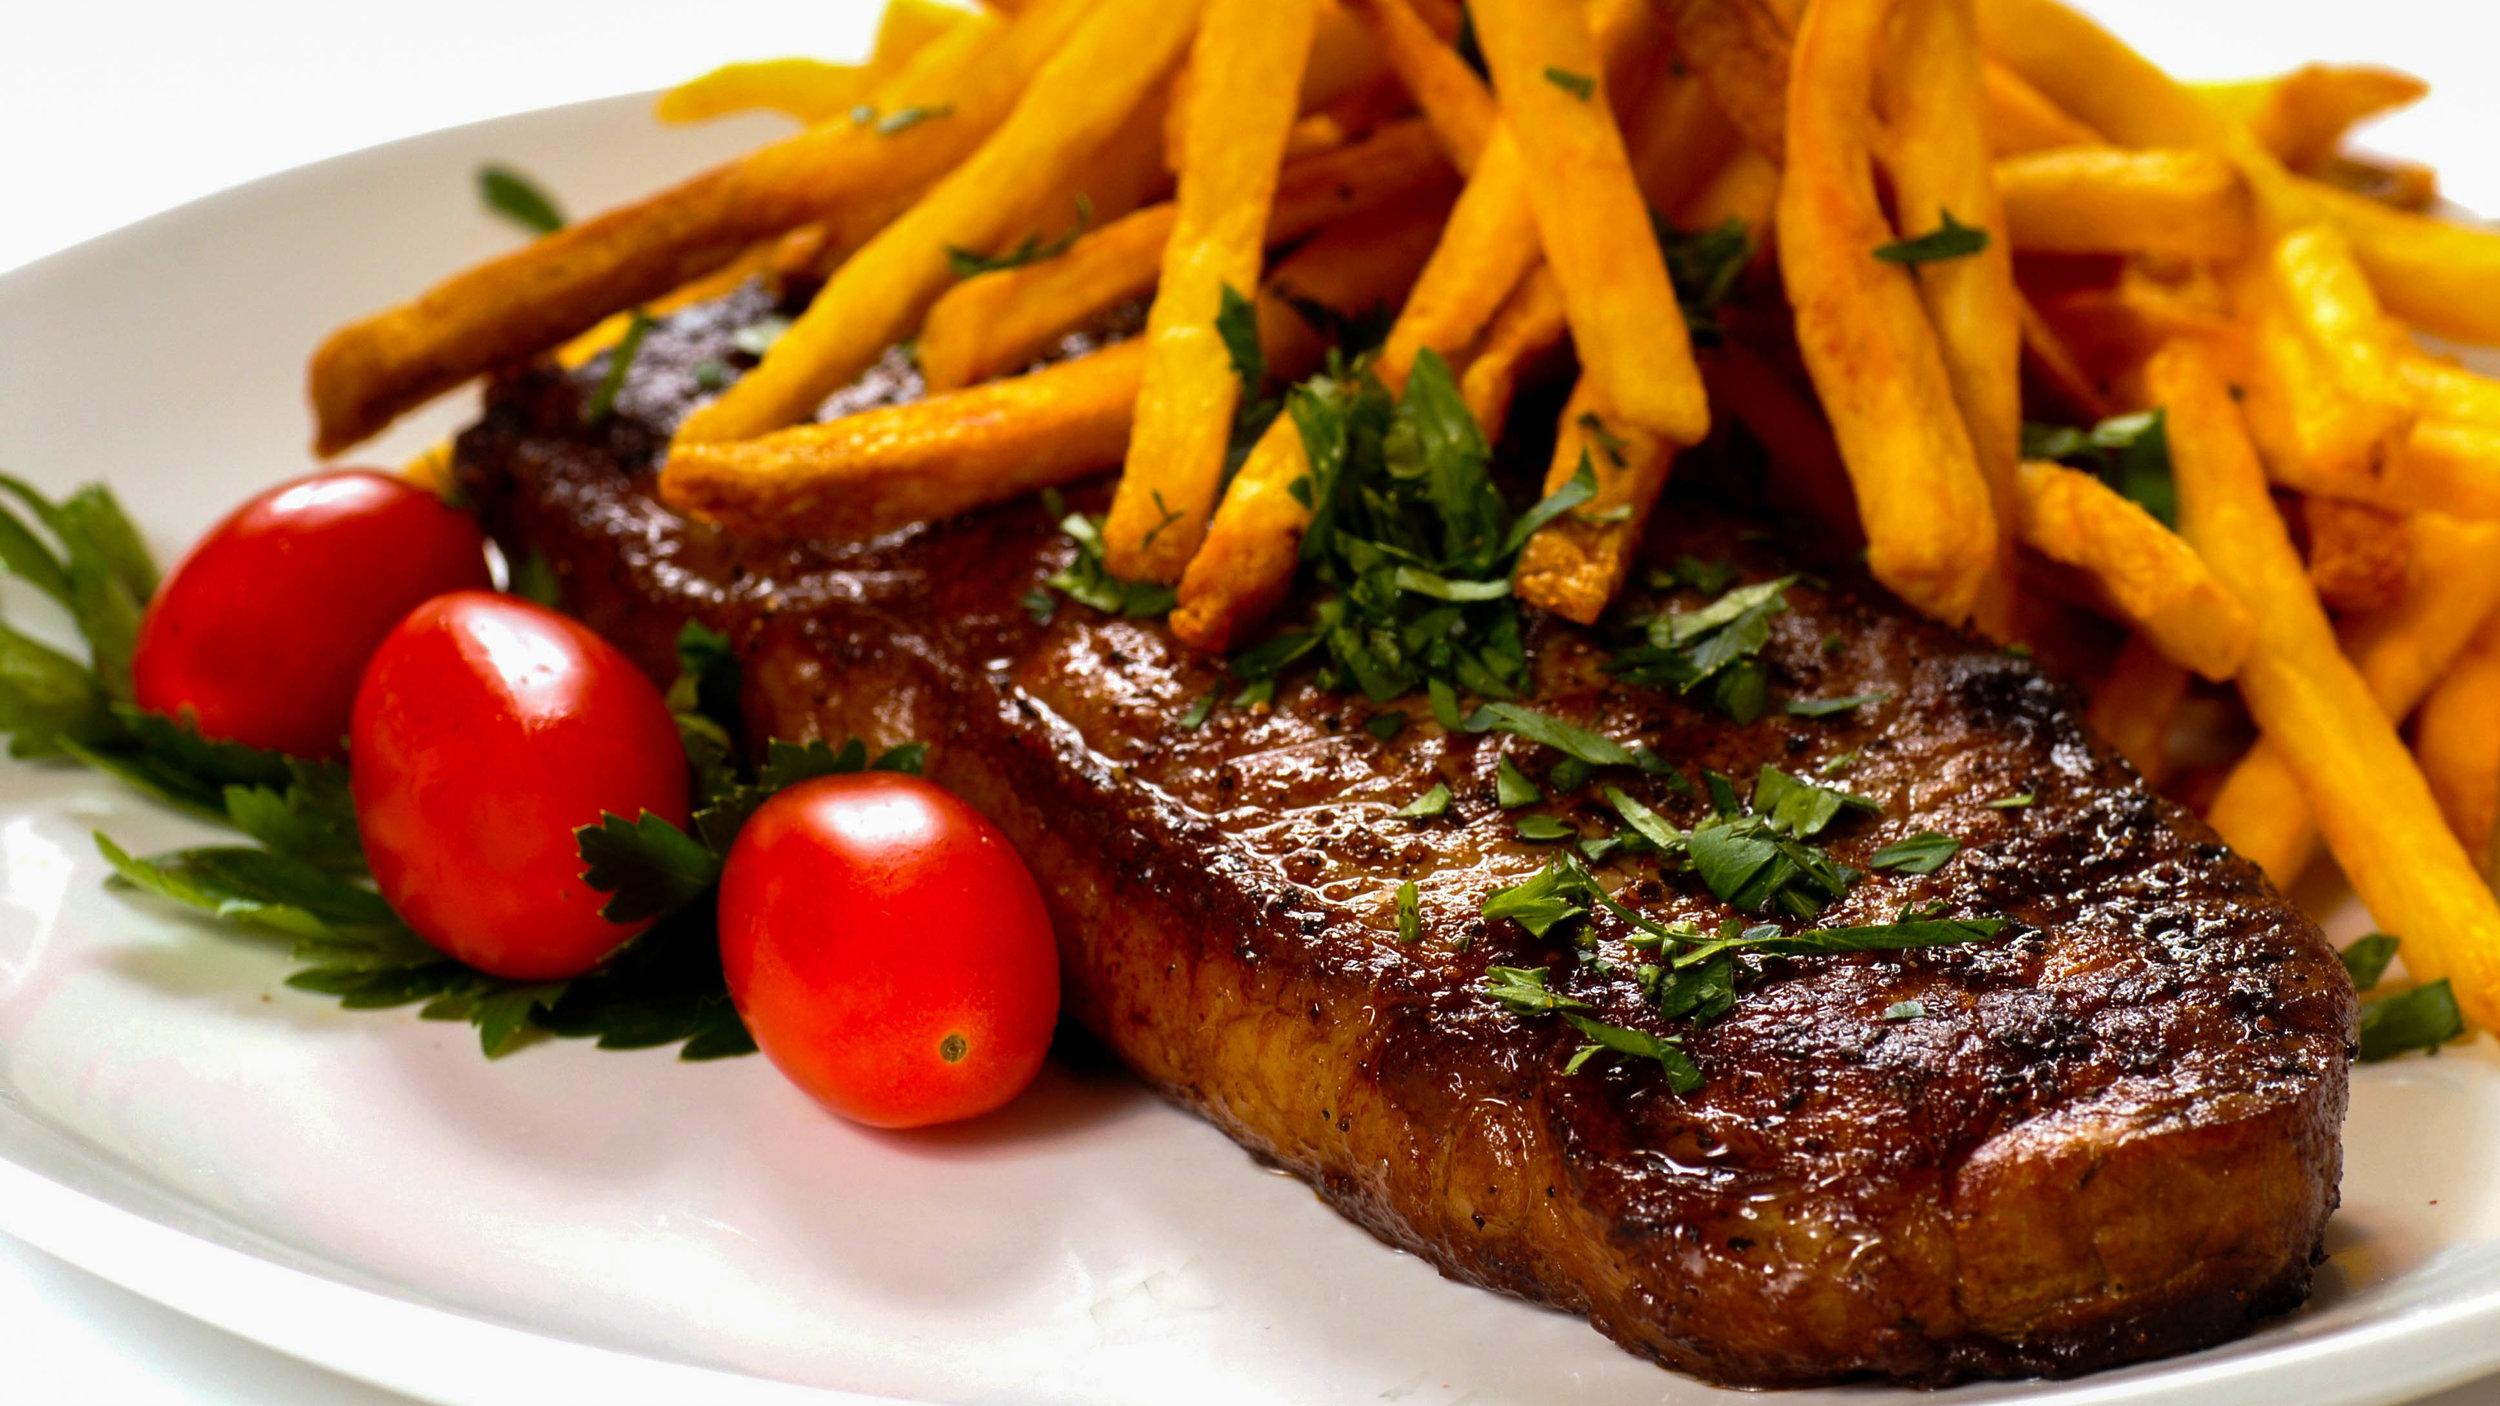 steak-2-alr-c169-169.jpg